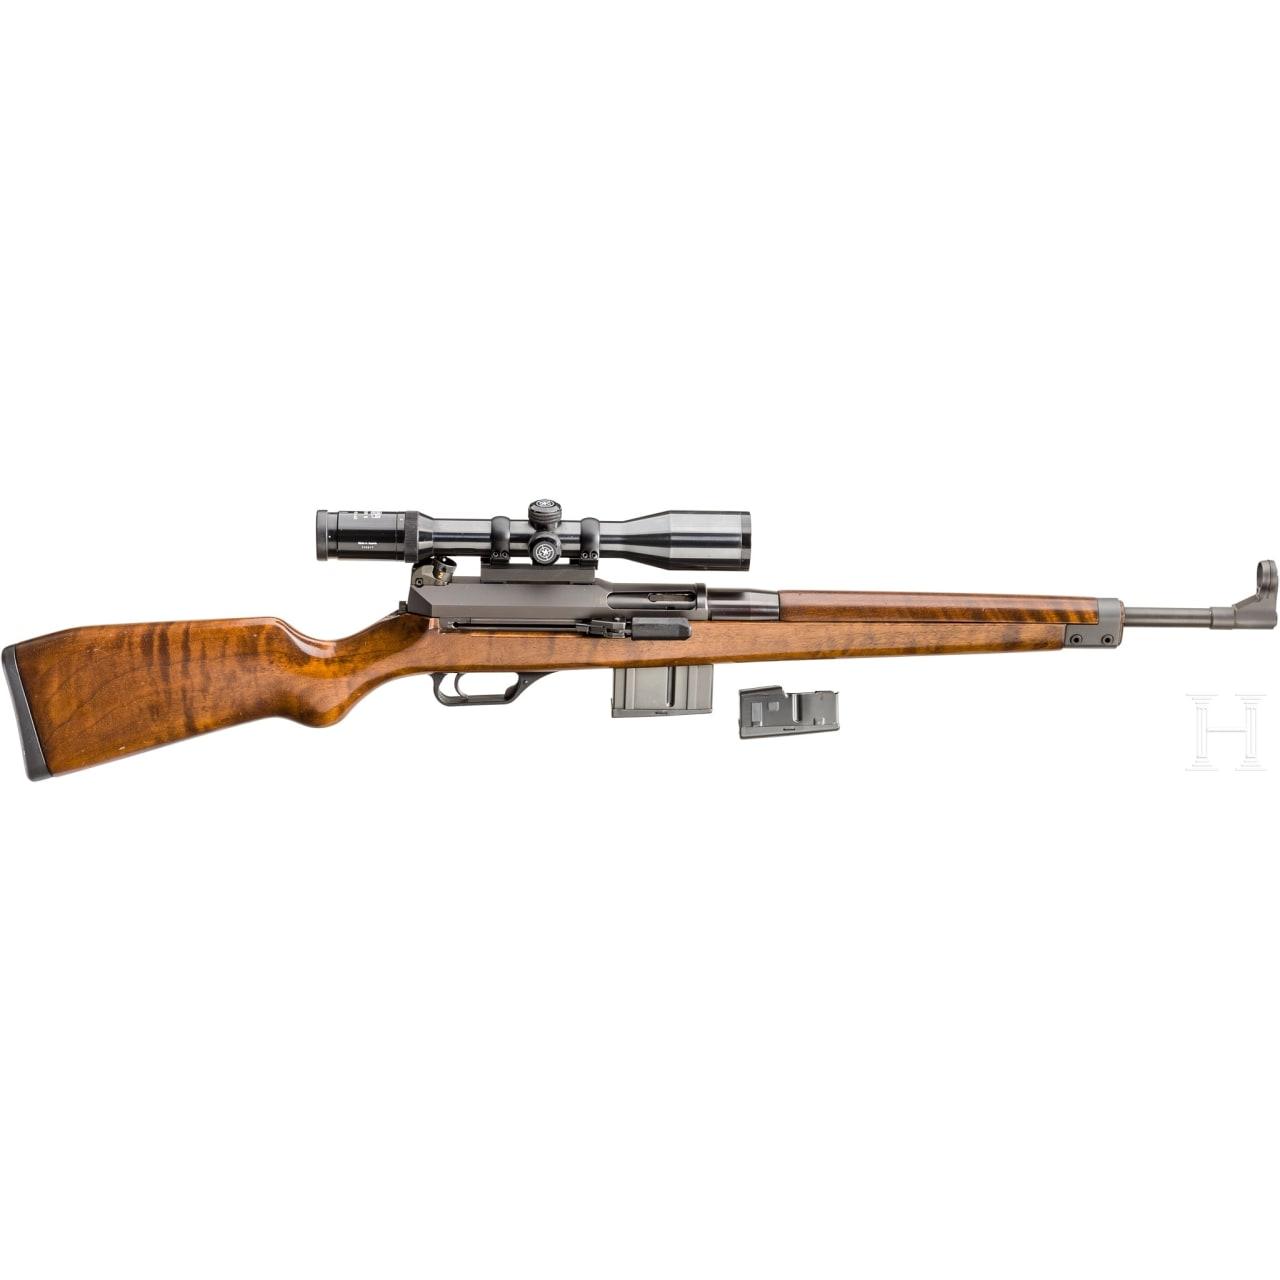 Heckler & Koch Mod. SL 7 semi-auti rifle, with a Kahles scope